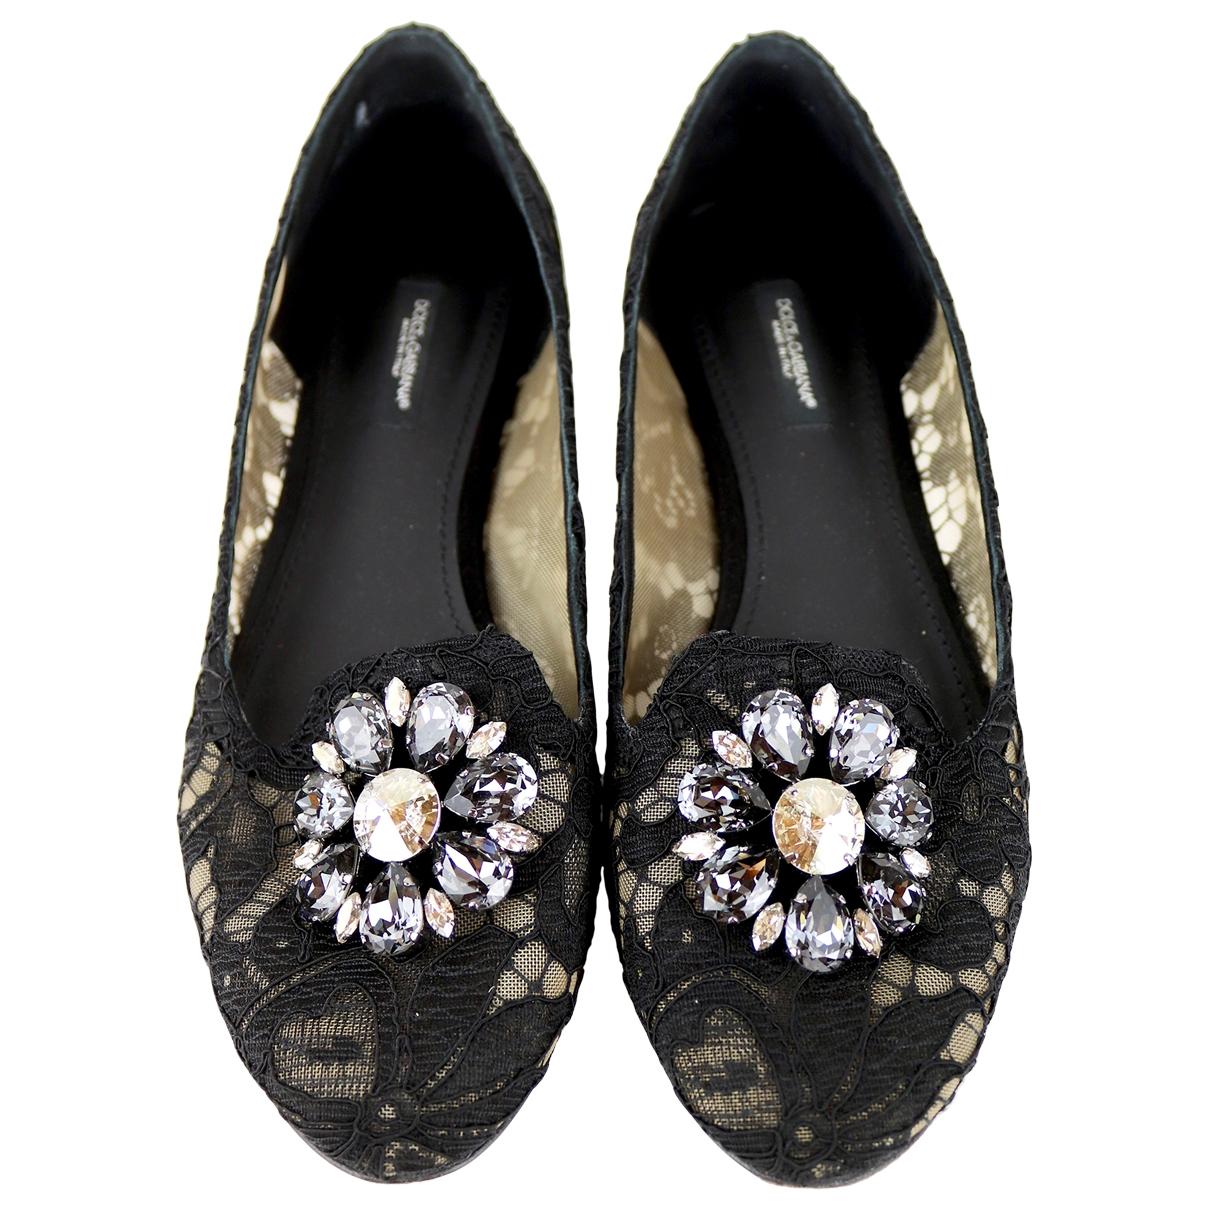 Bailarinas de Lona Dolce & Gabbana